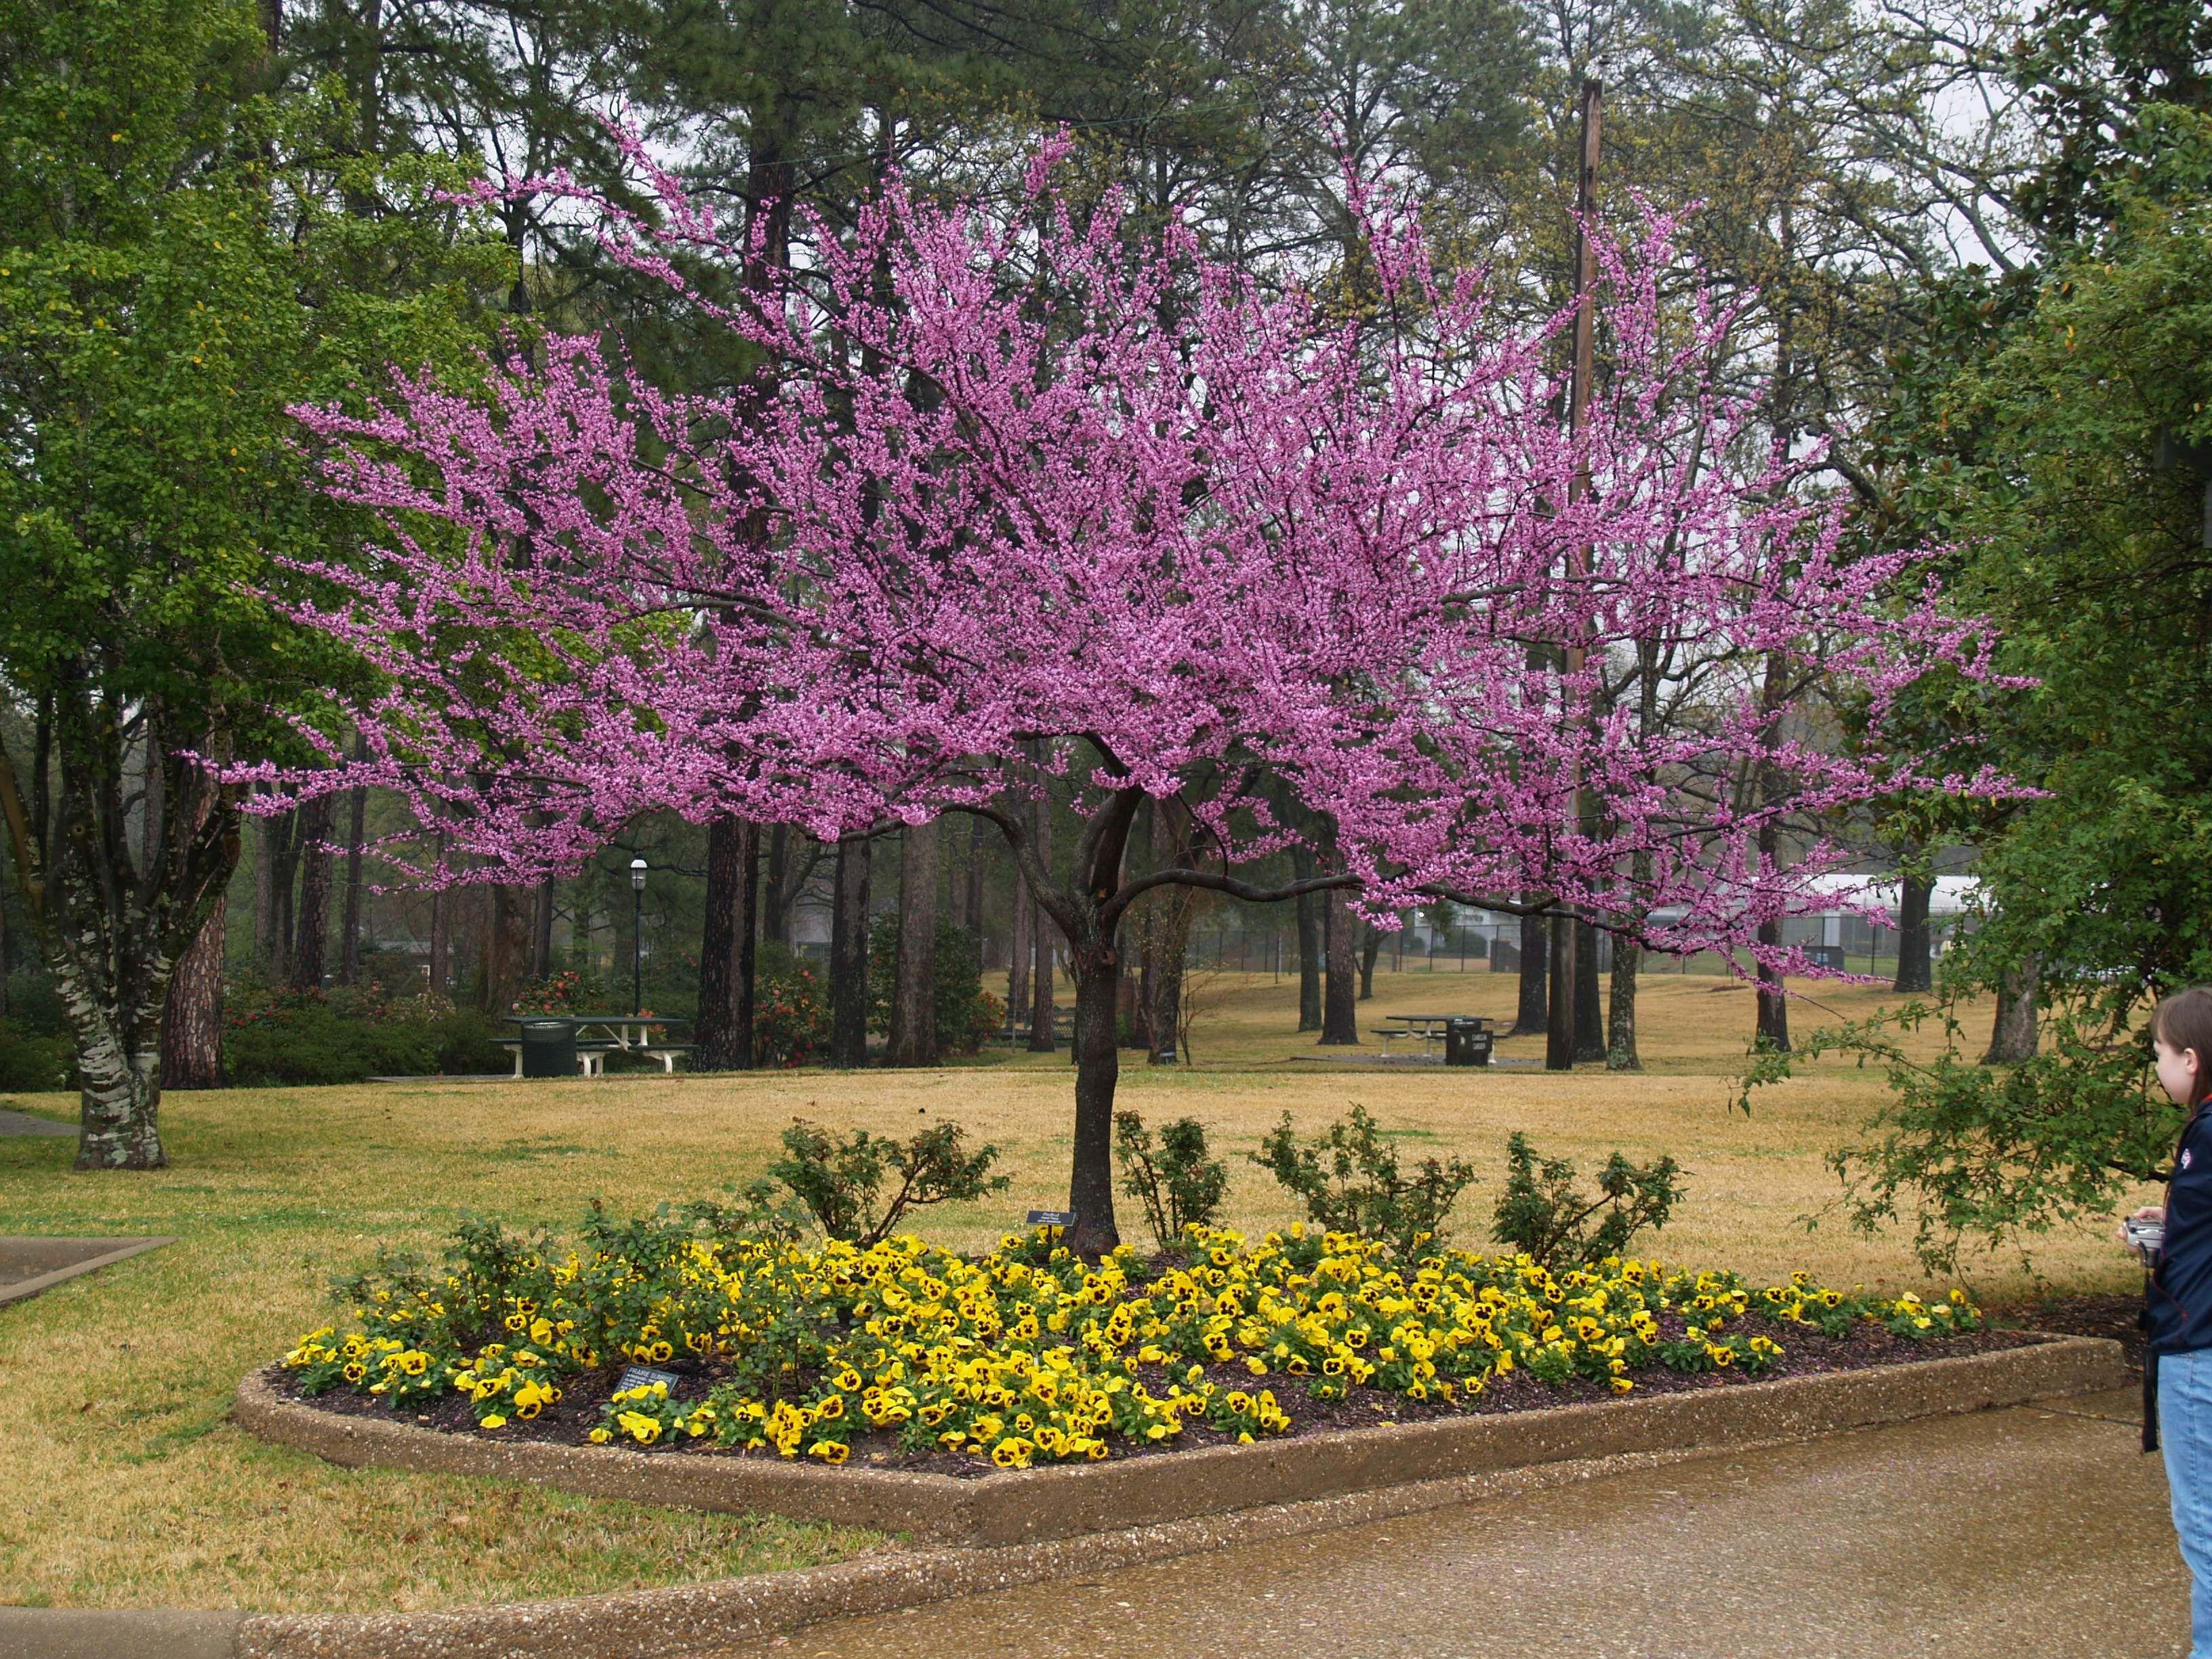 Pin By Patrice Steele On Home Outside Decor Redbud Tree Fruit Trees Backyard Ornamental Trees